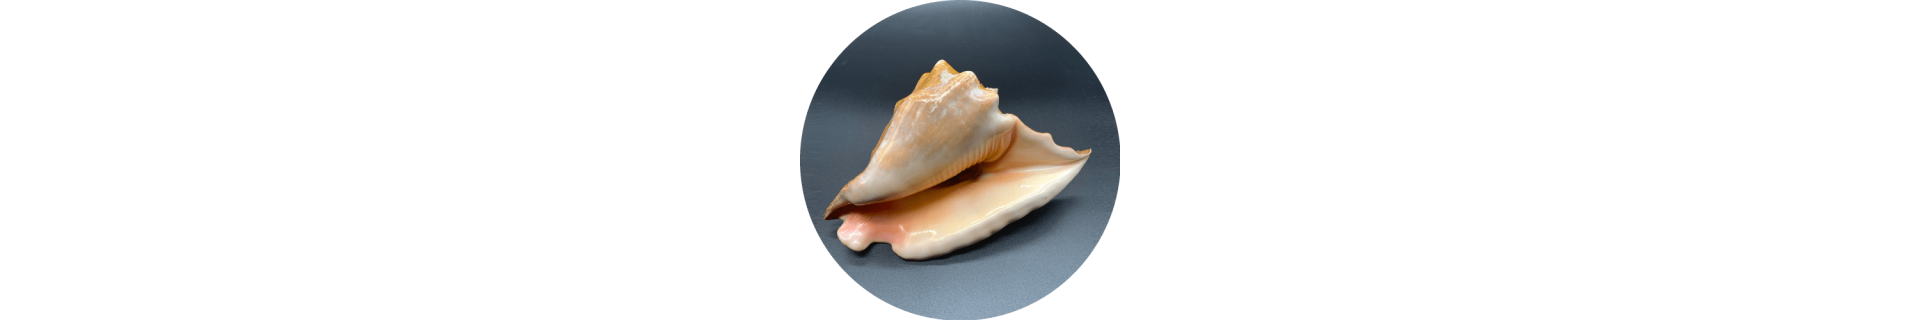 Gastéropodes